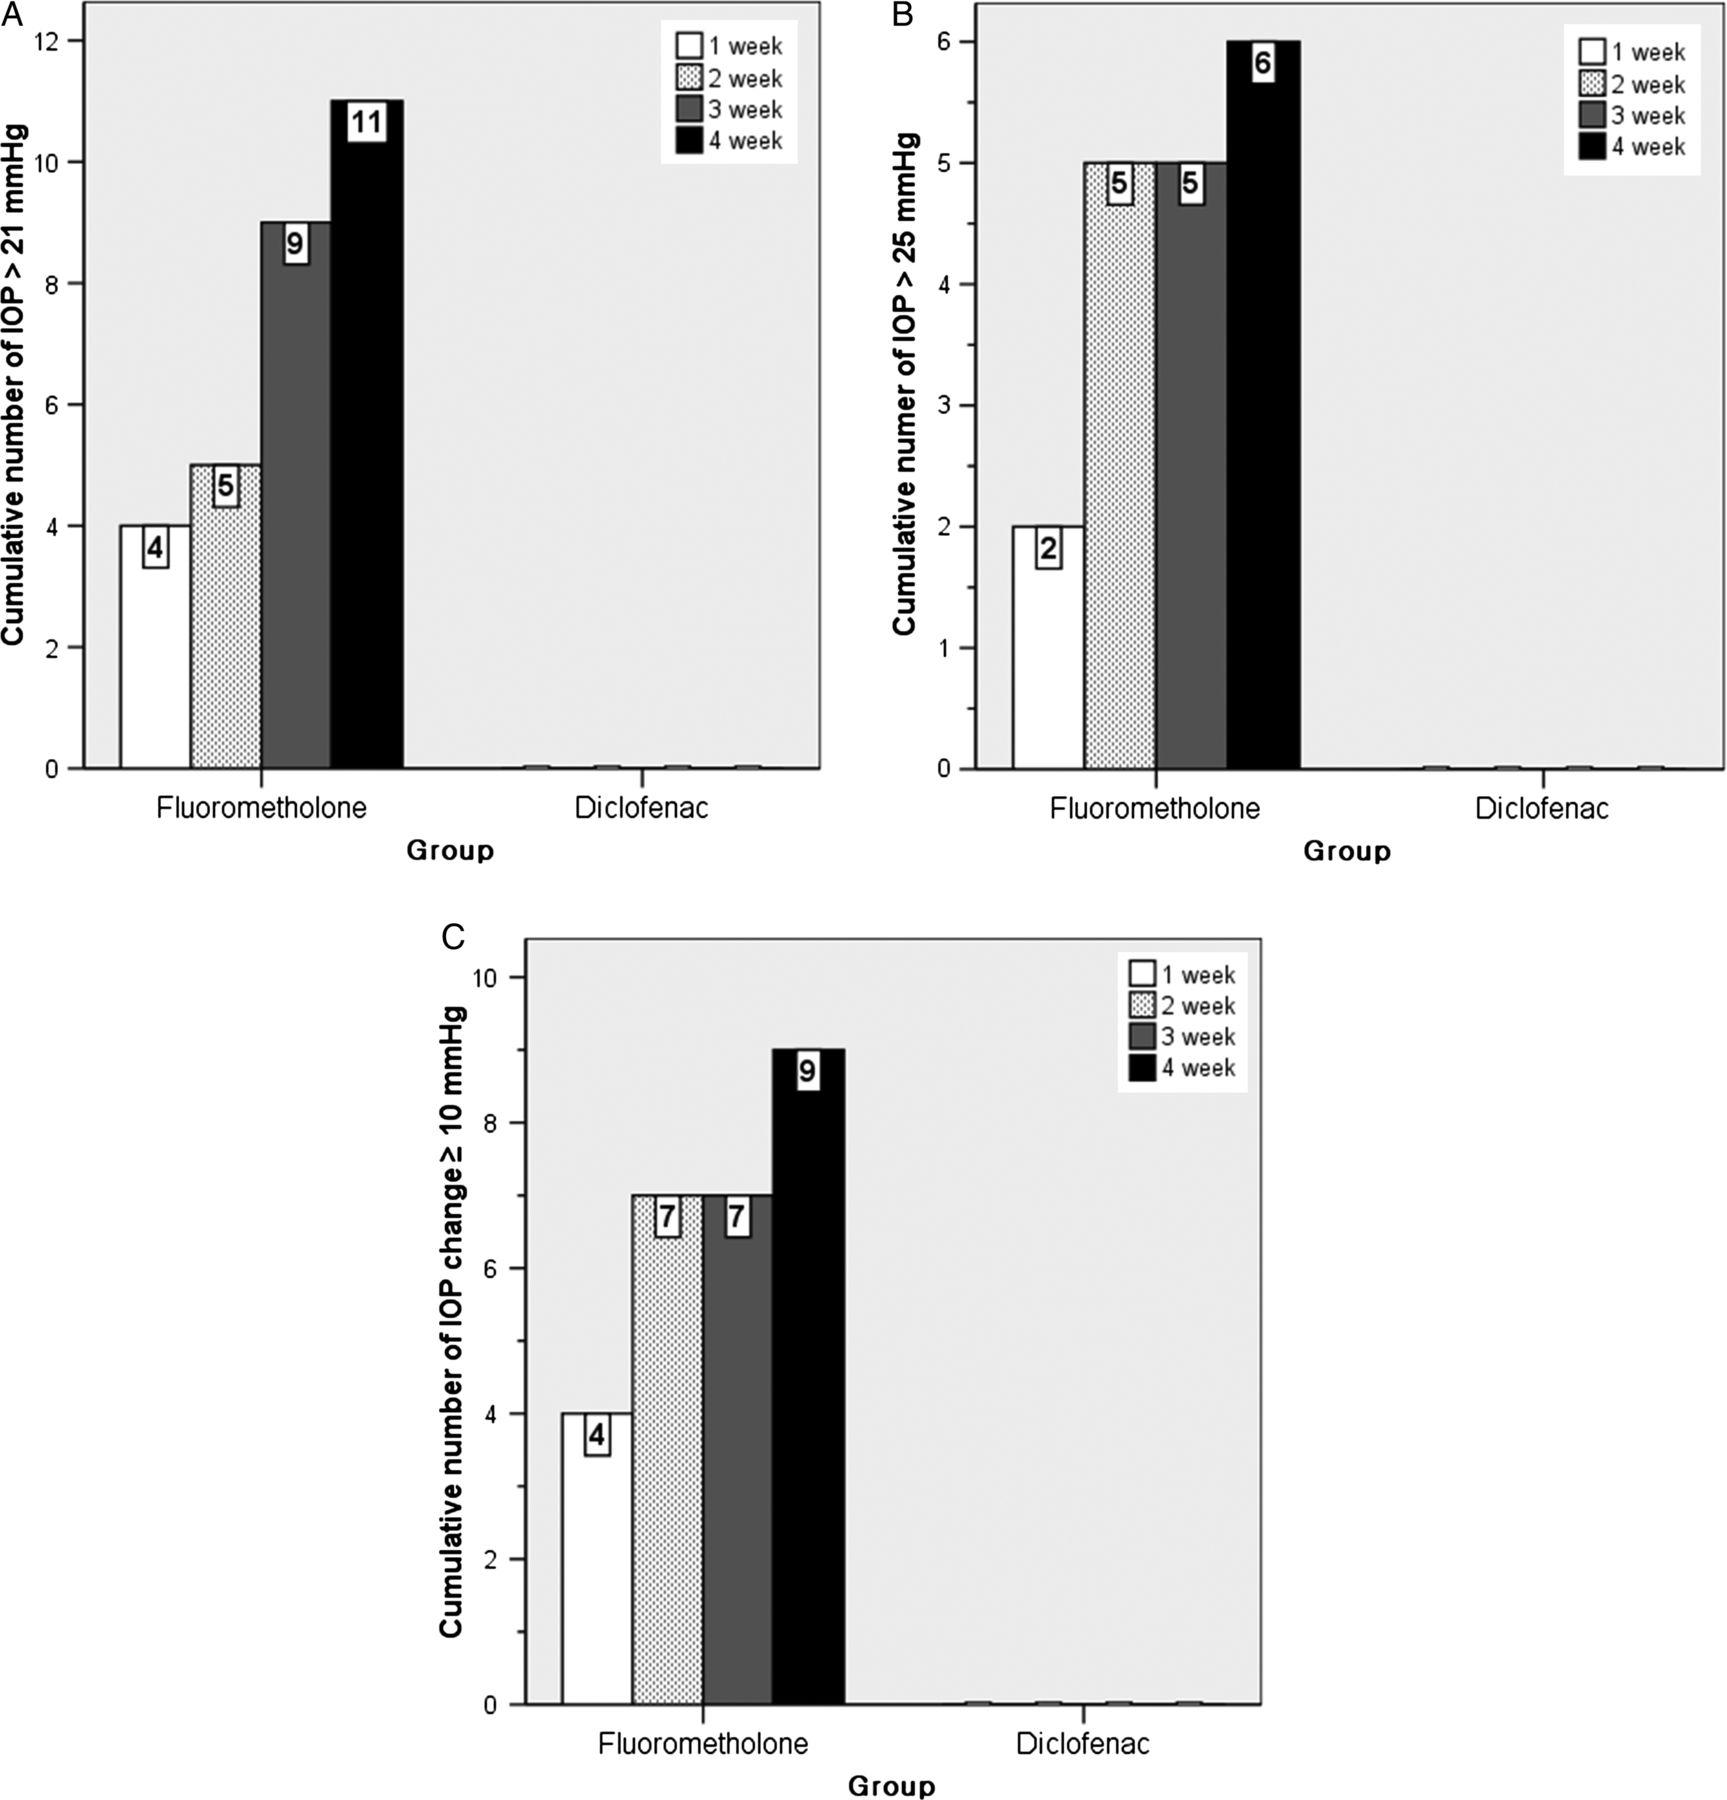 Diclofenac versus fluorometholone after strabismus surgery